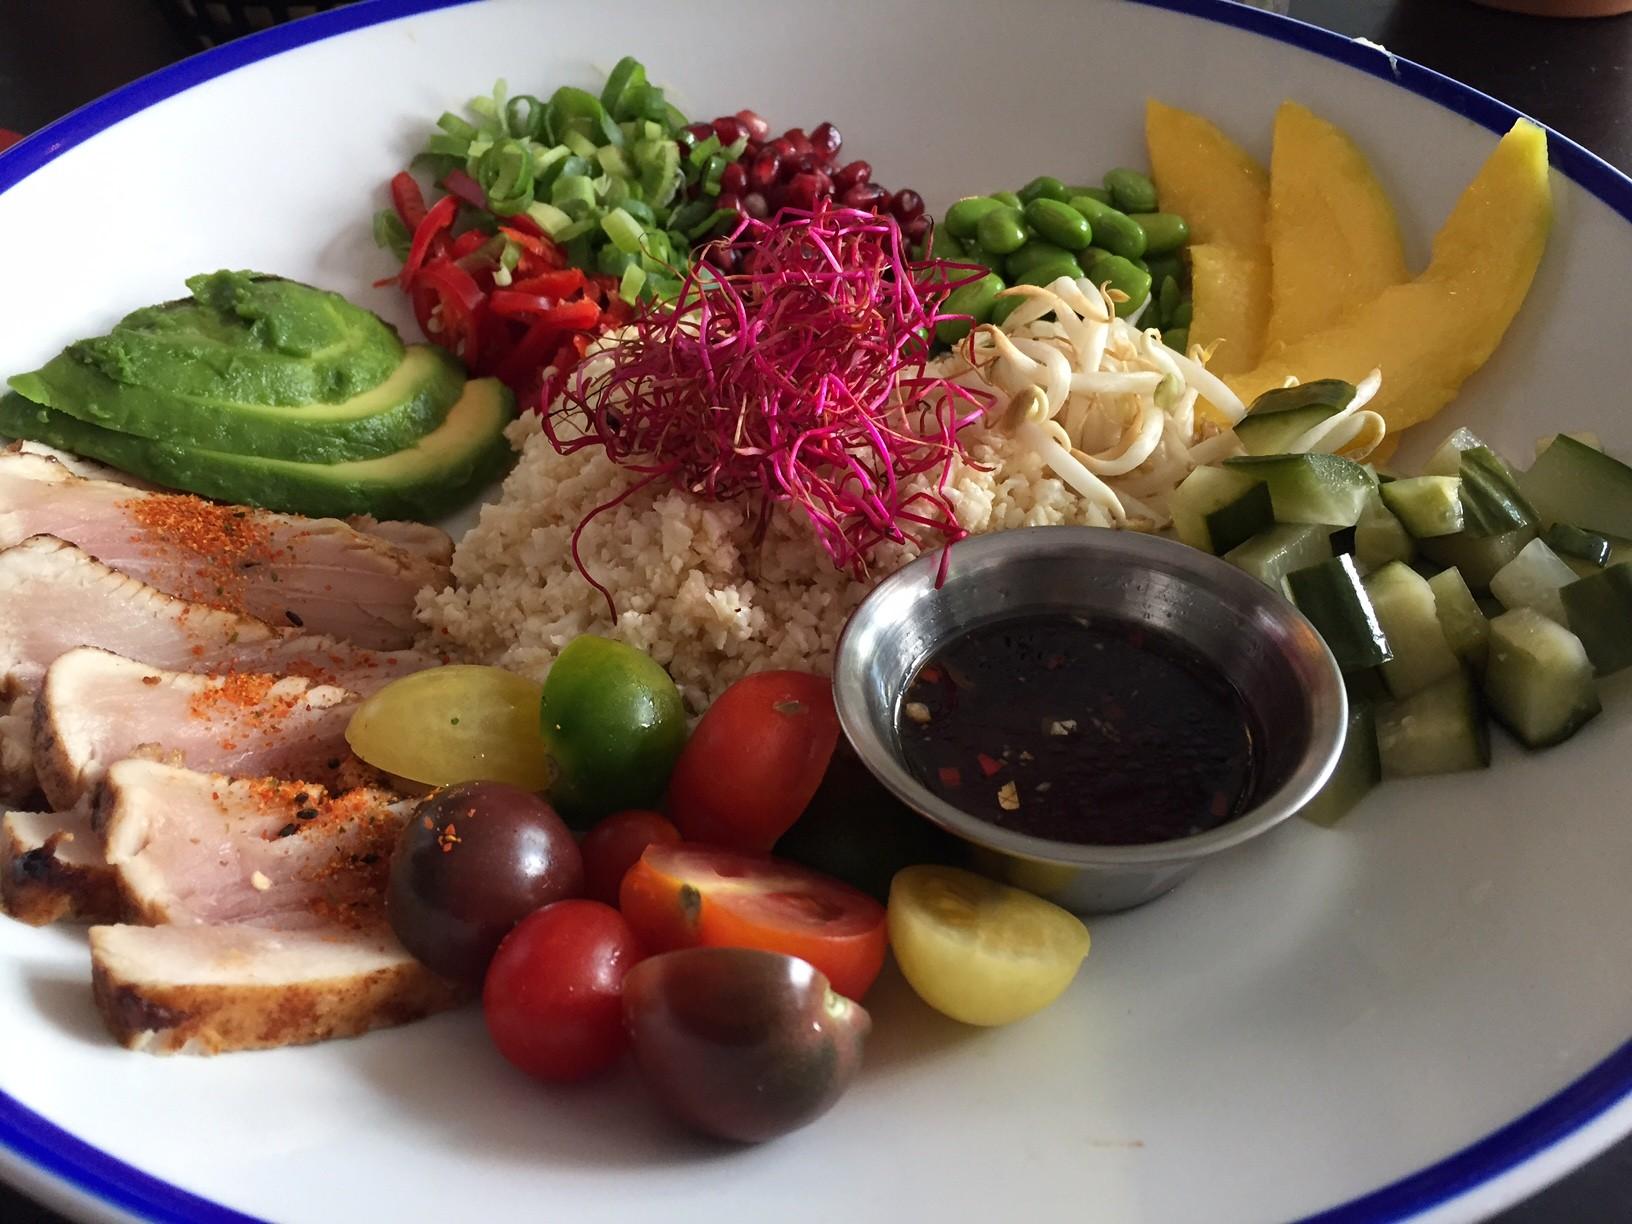 Gezondigen poké powl bij SNCKBR in Eindhoven foodblog Foodinista restaurant review